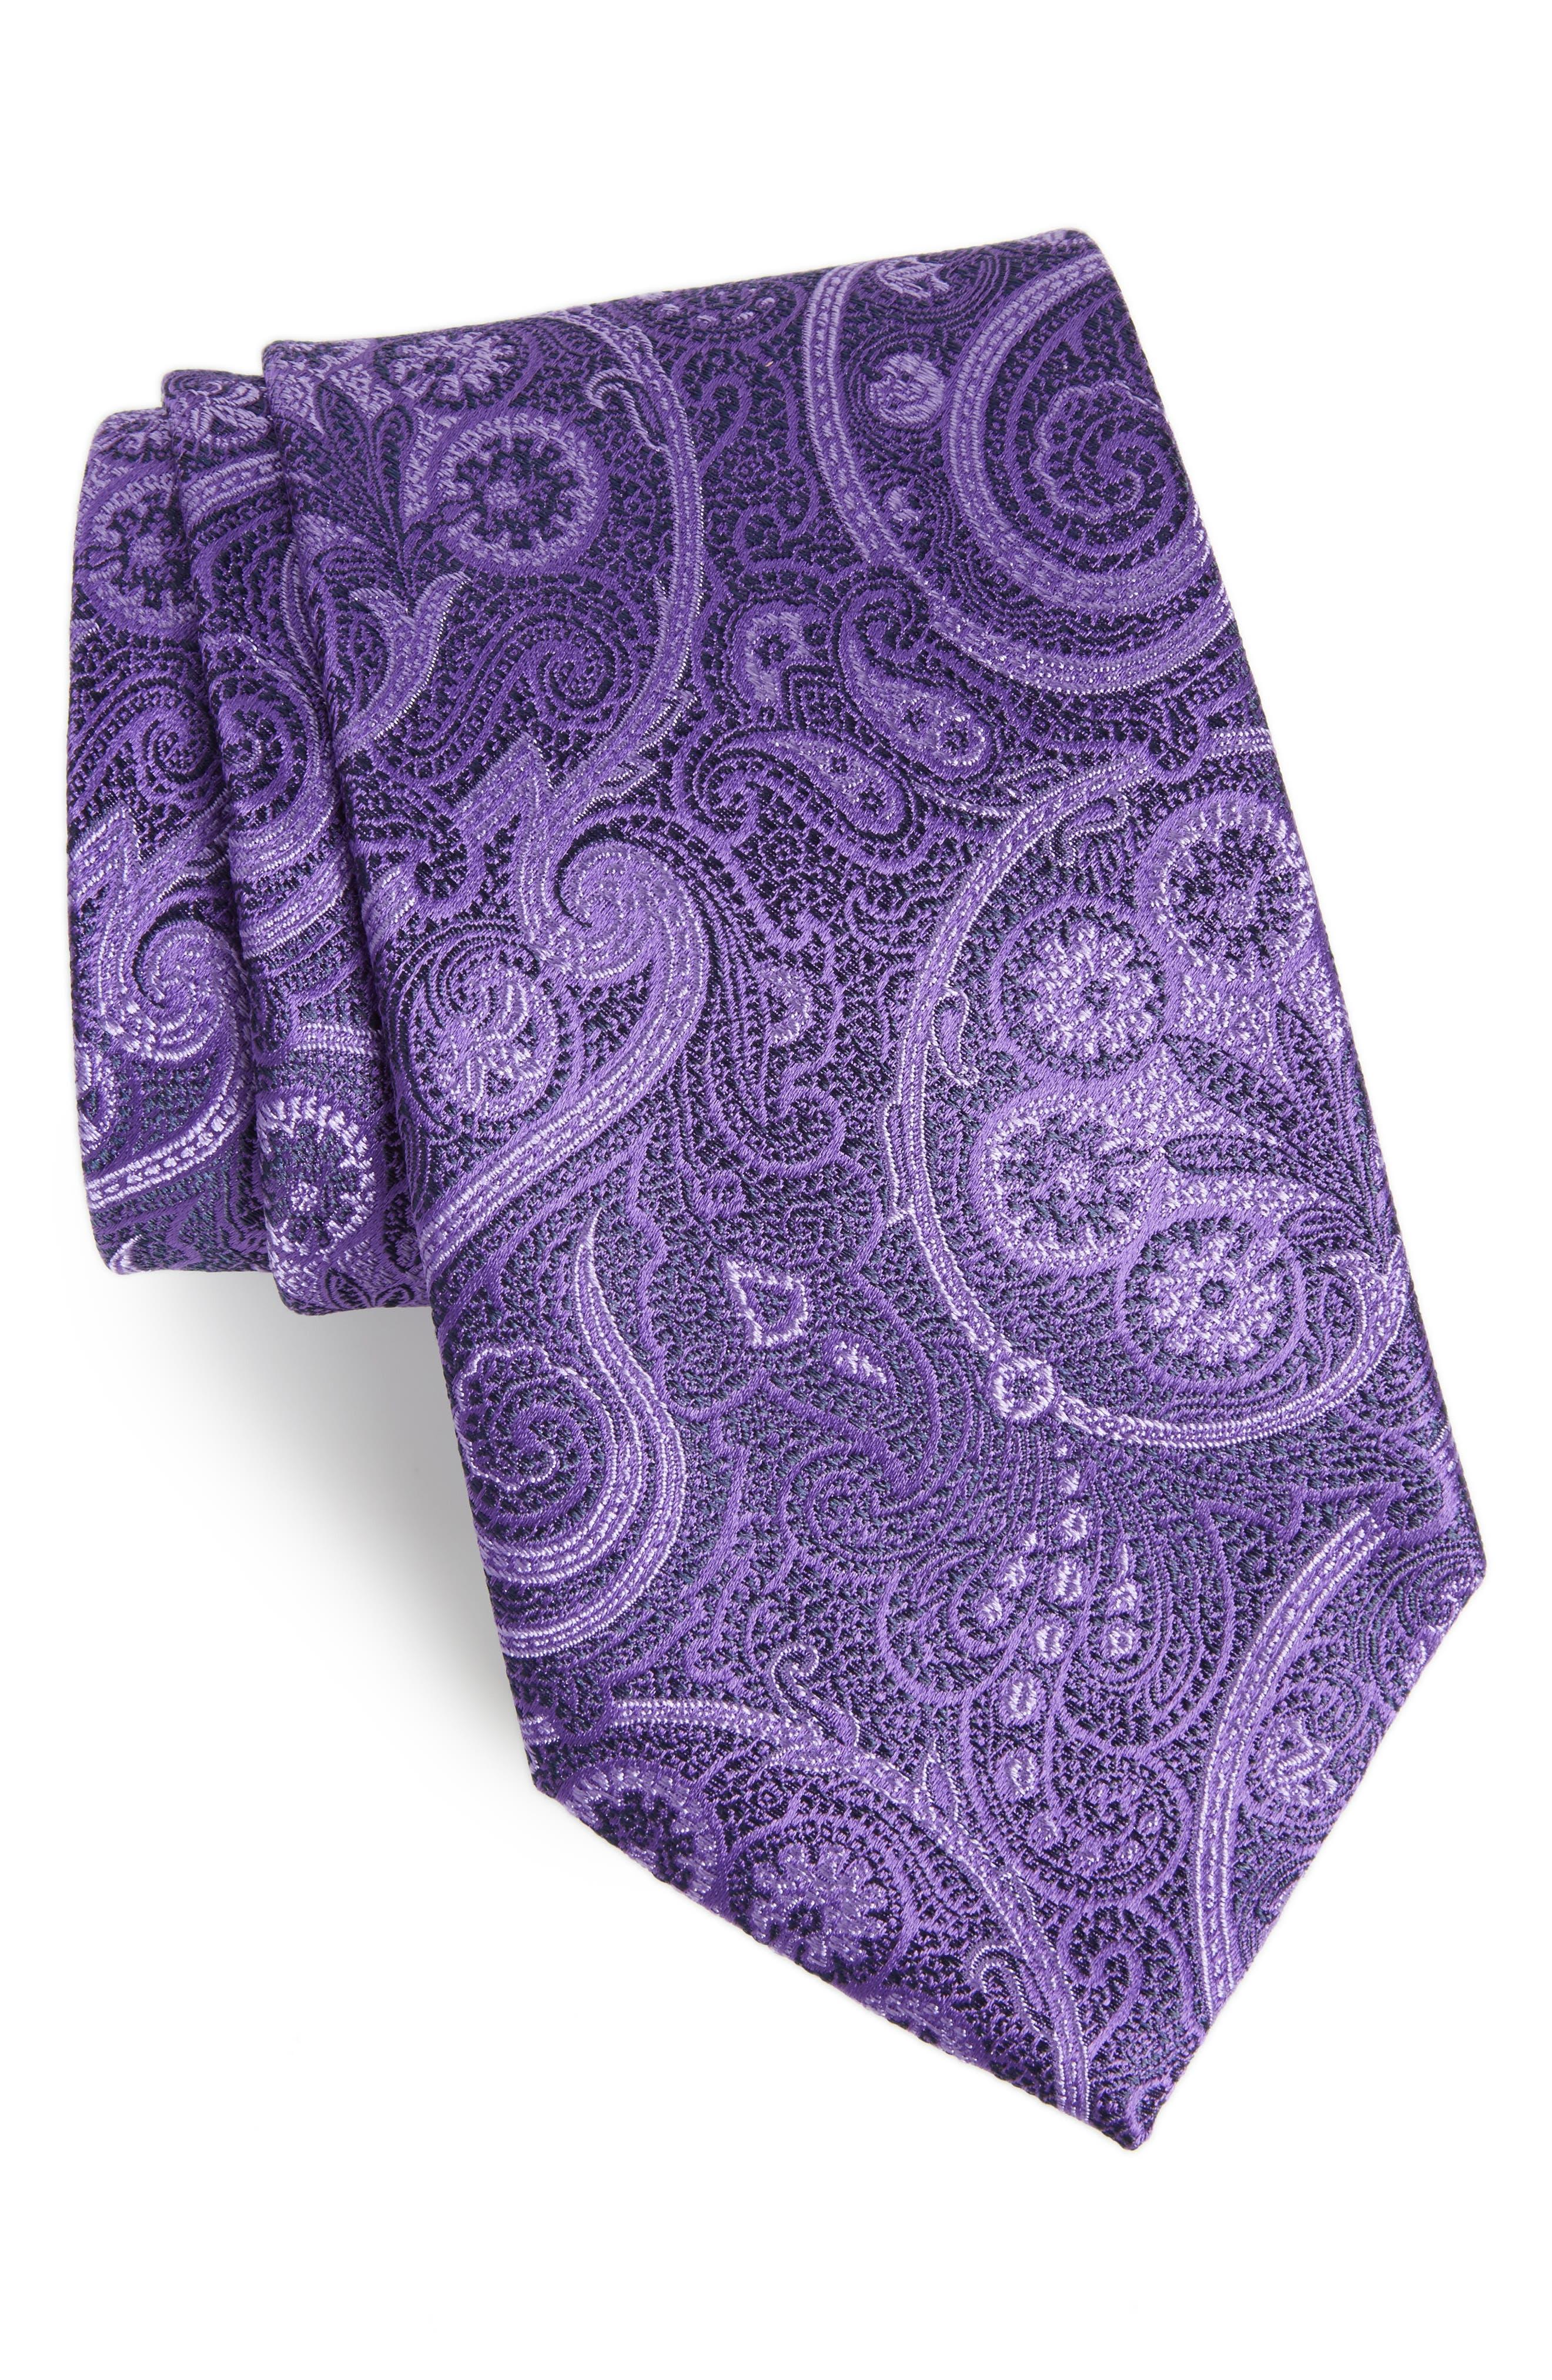 Main Image - Nordstrom Men's Shop Provincial Paisley Silk Tie (X-Long)